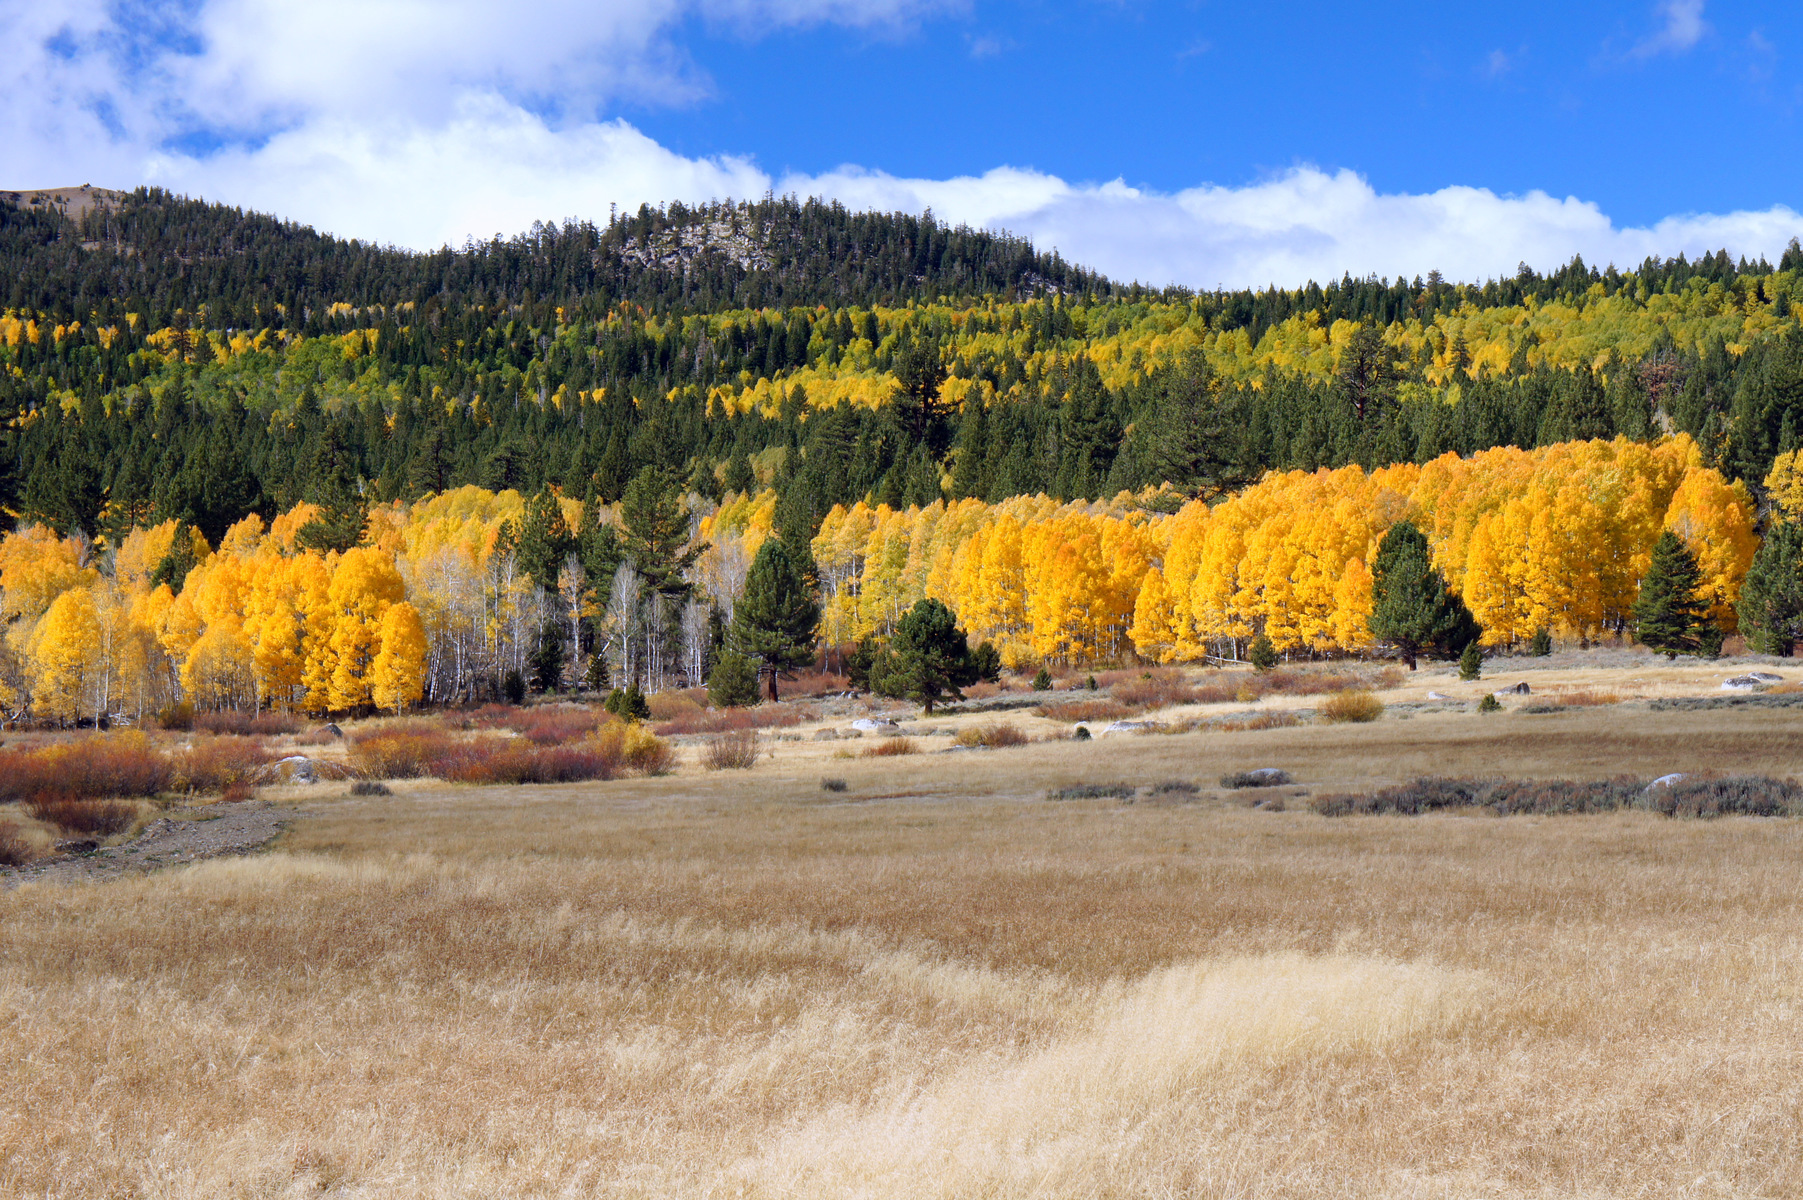 south of Lake Tahoe, California